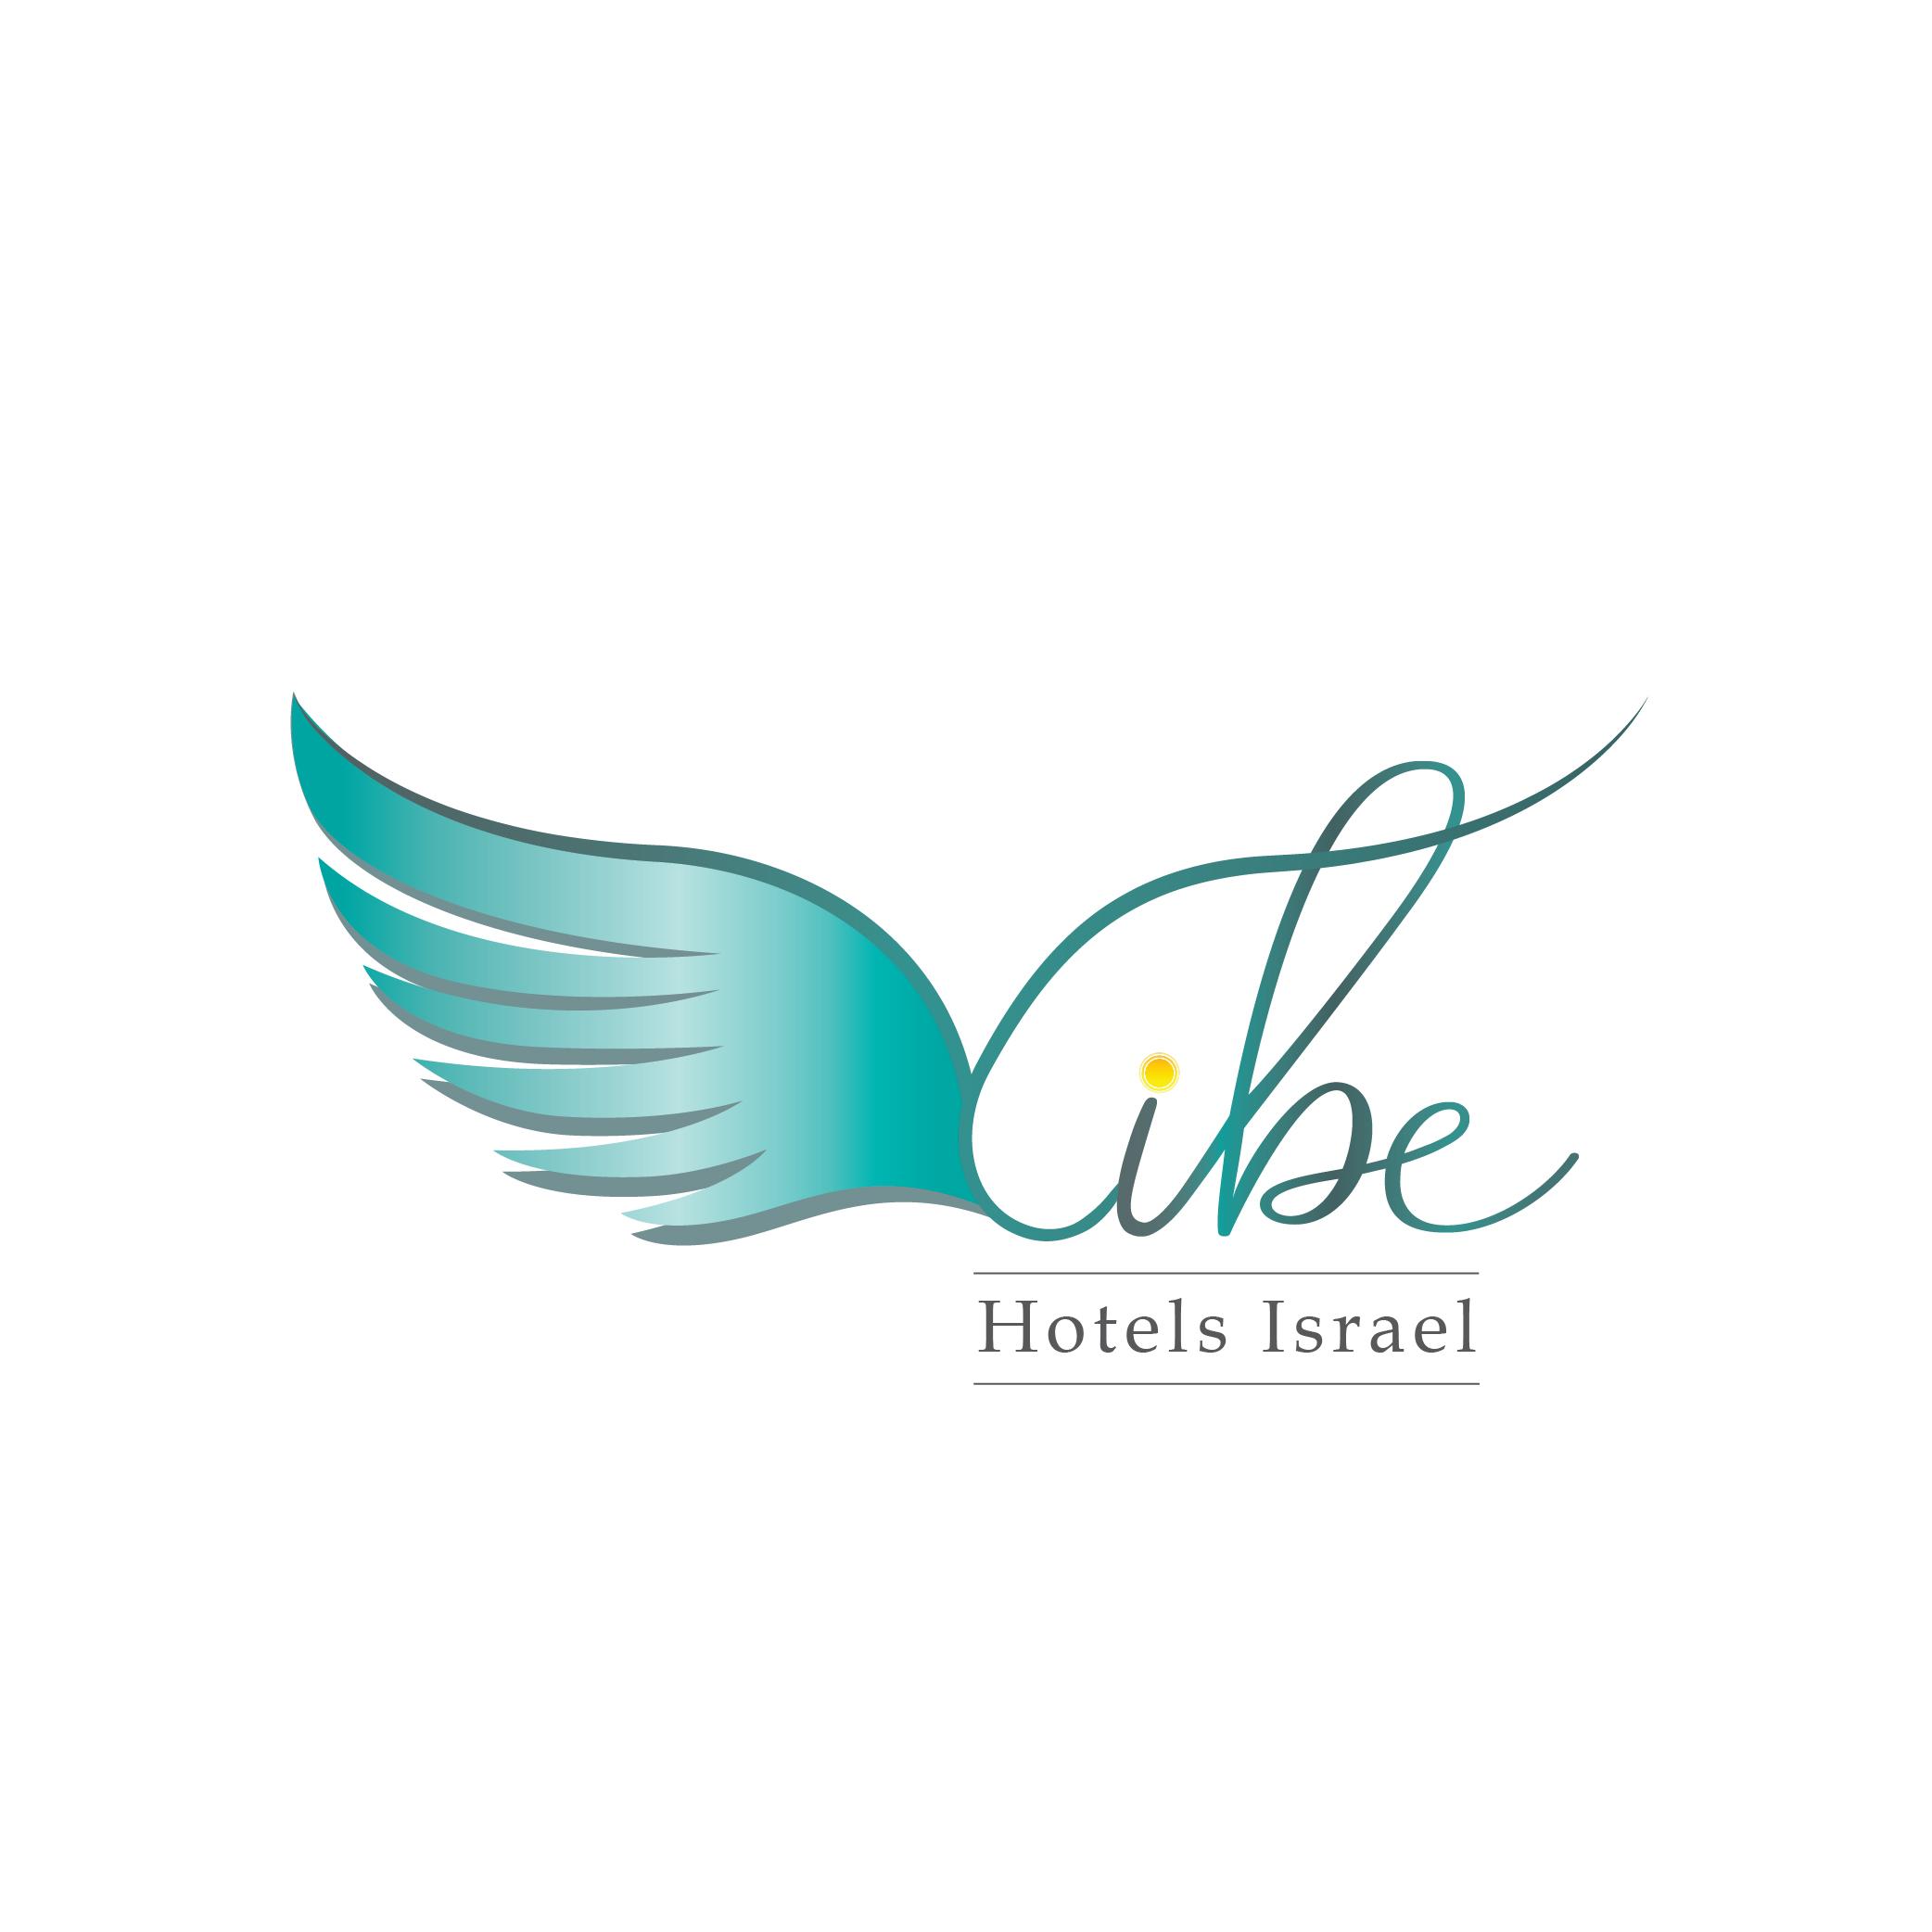 vibe hotels israel facebook-02-01